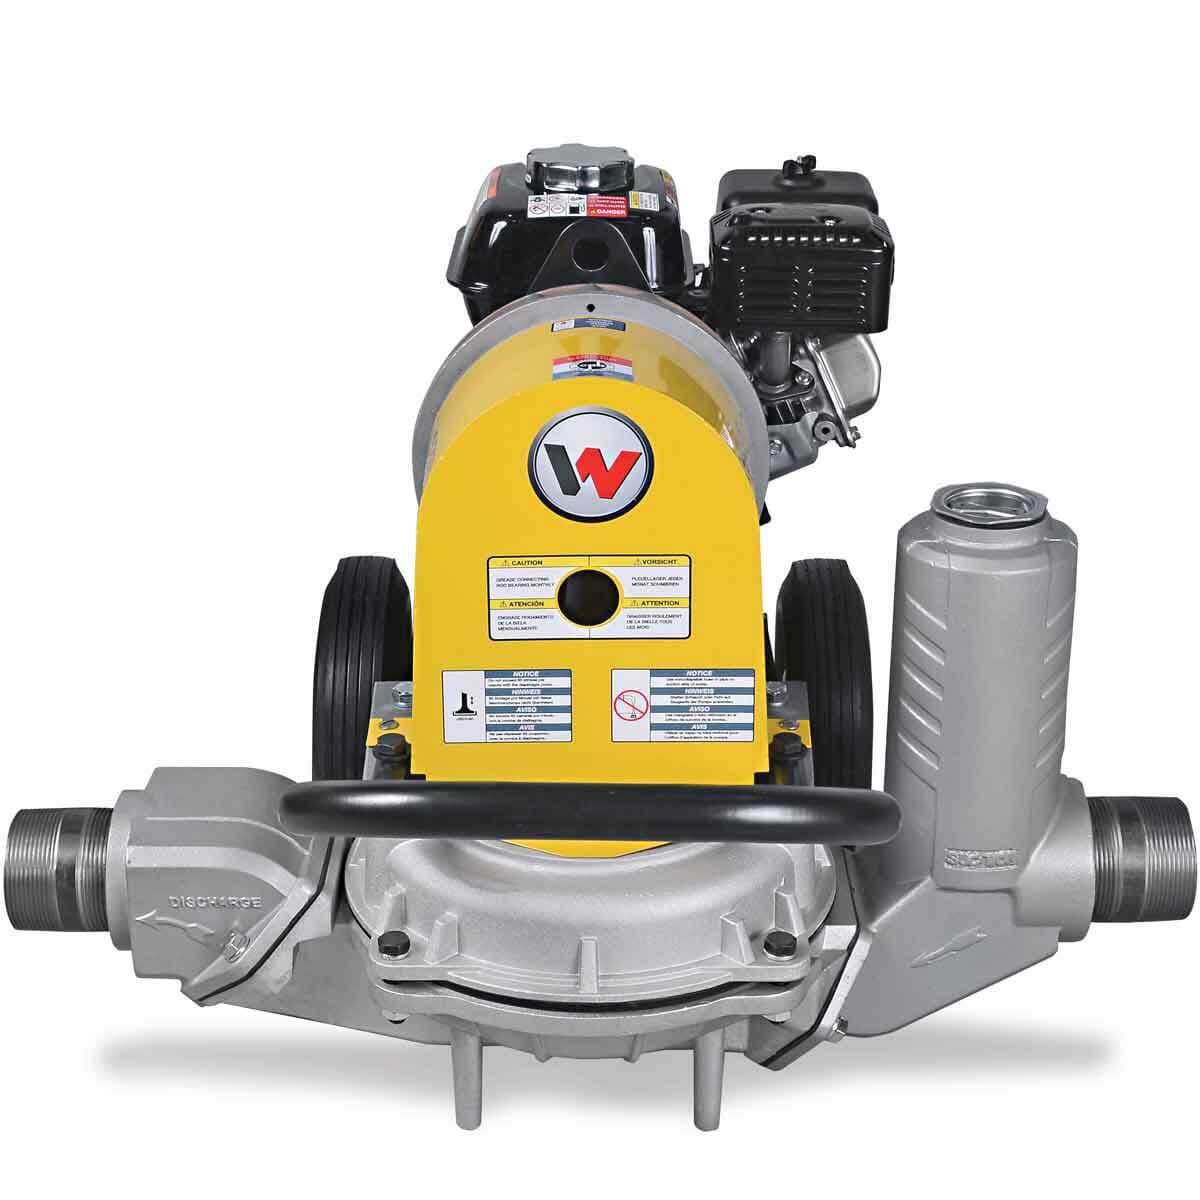 Wacker Neuson 3 inch Trash Pump 5000620773